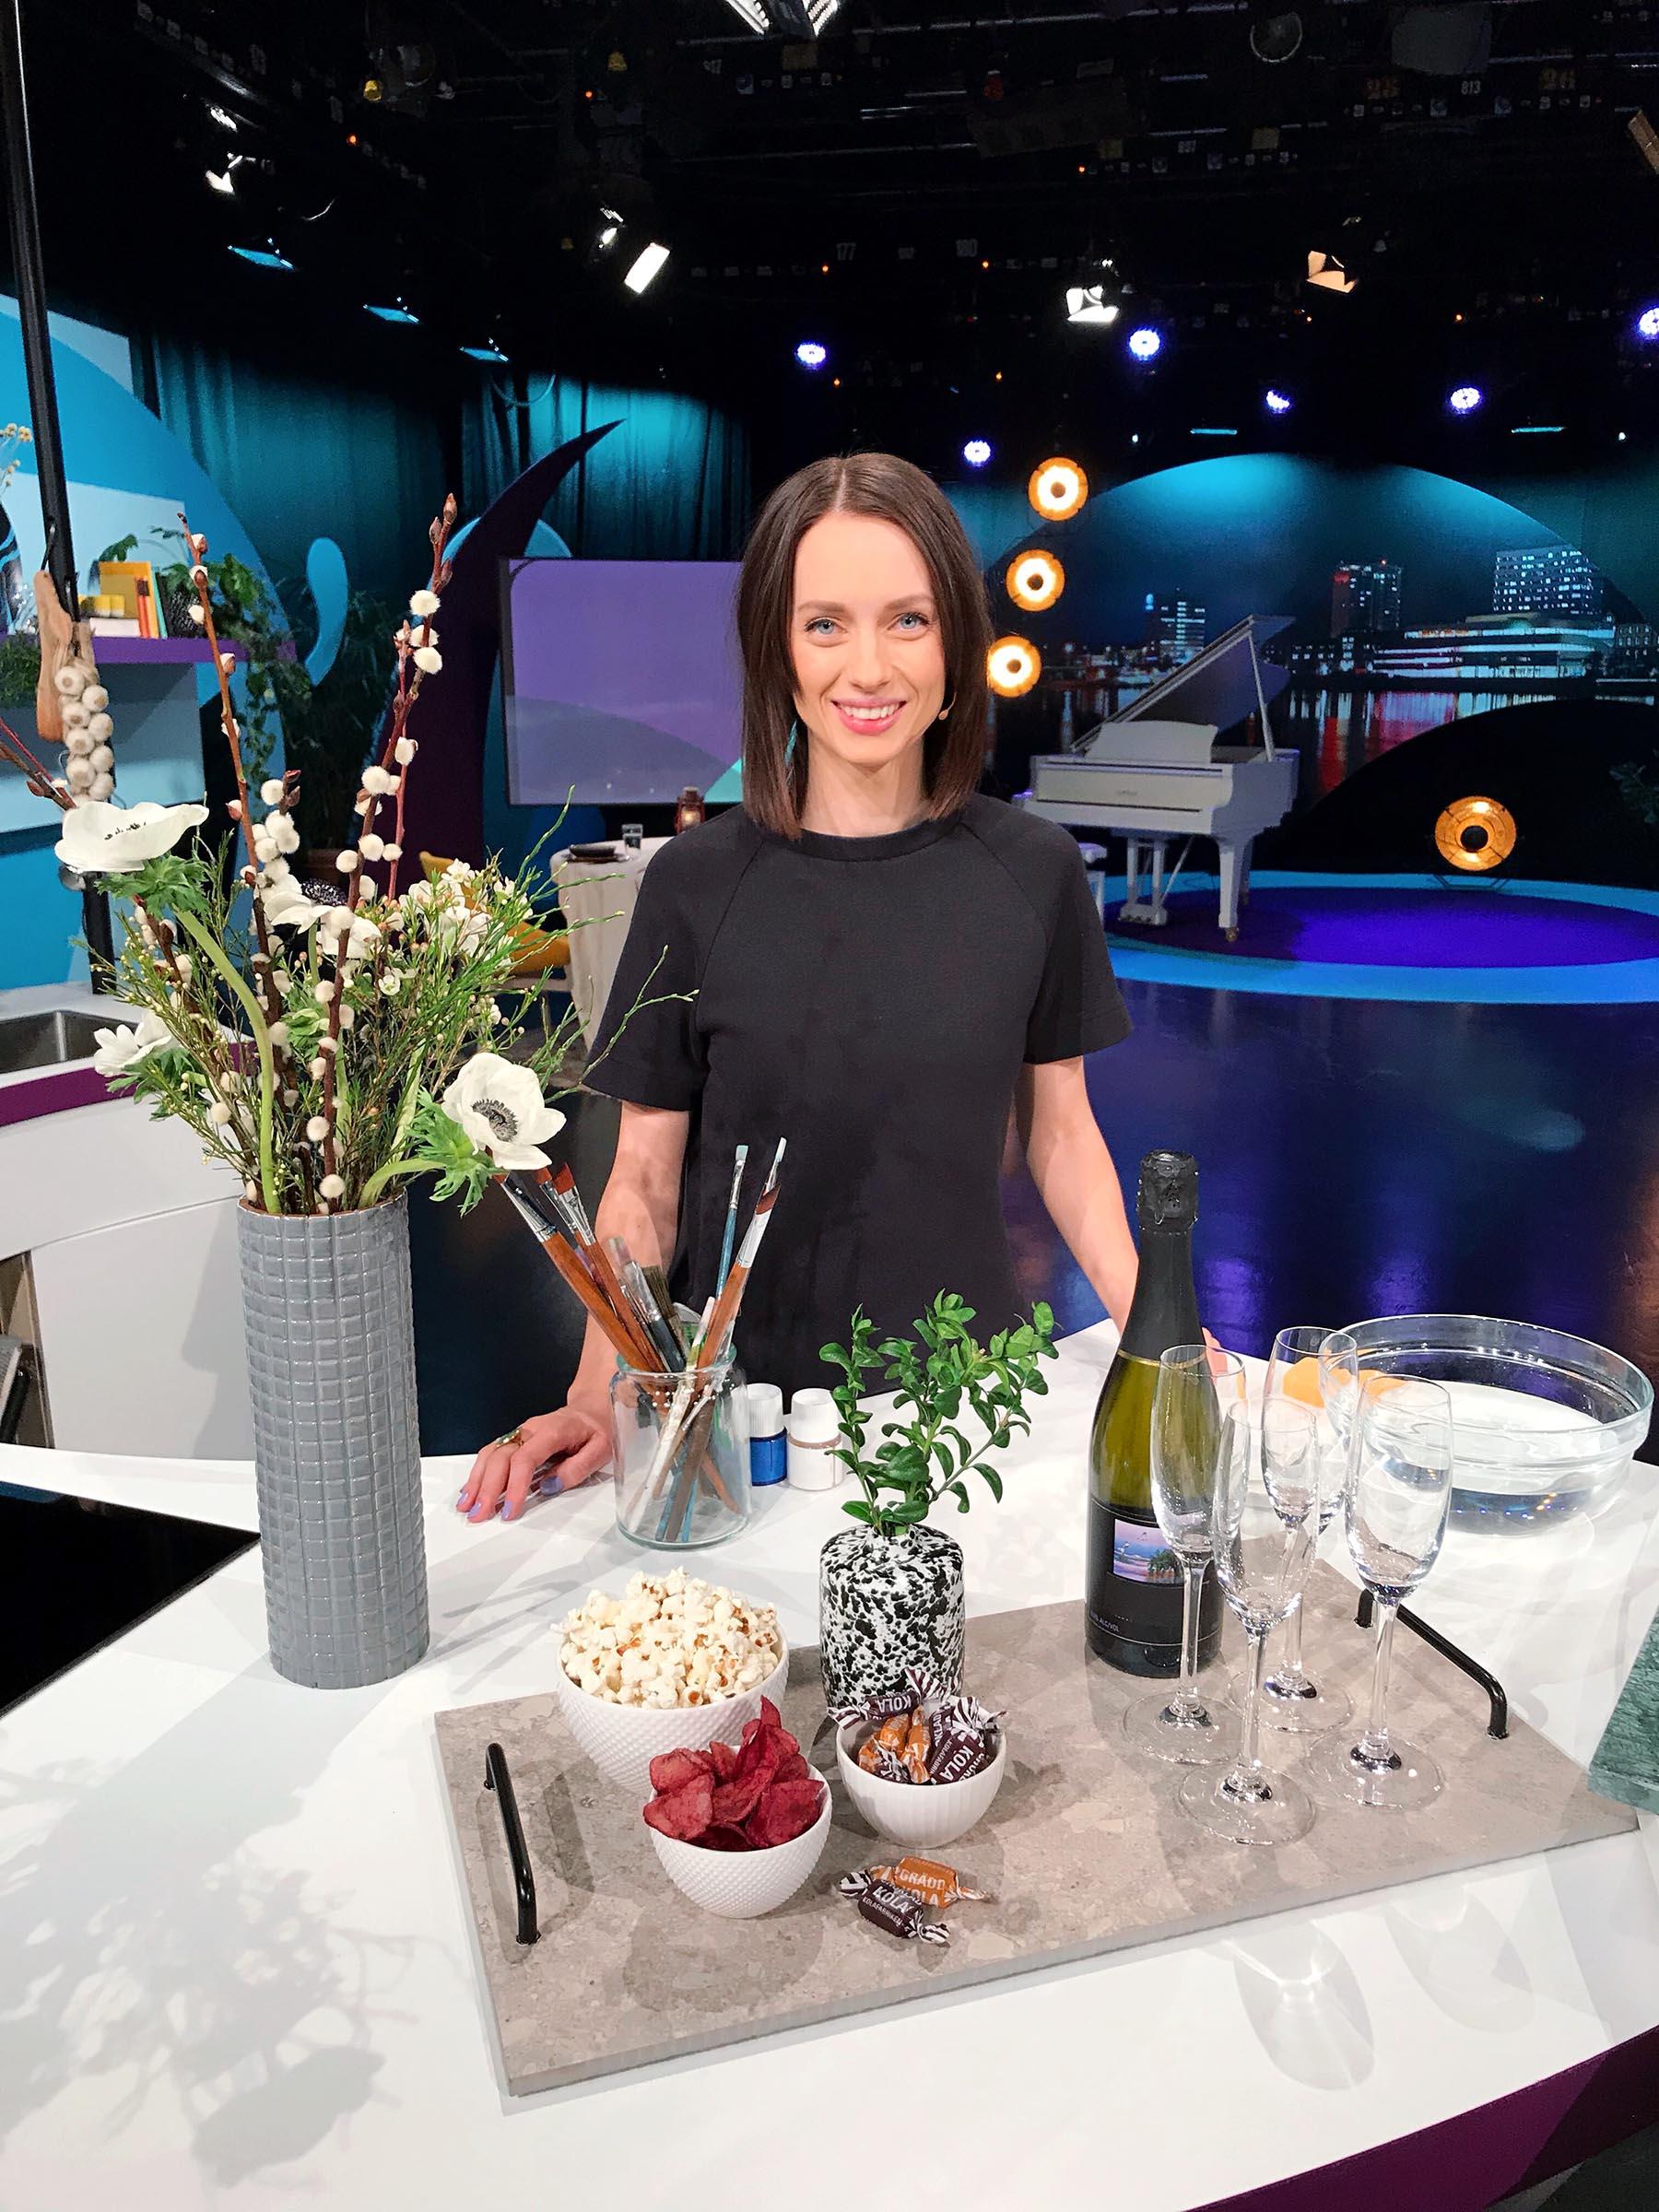 Go'kväll - Anna Maria Larsson